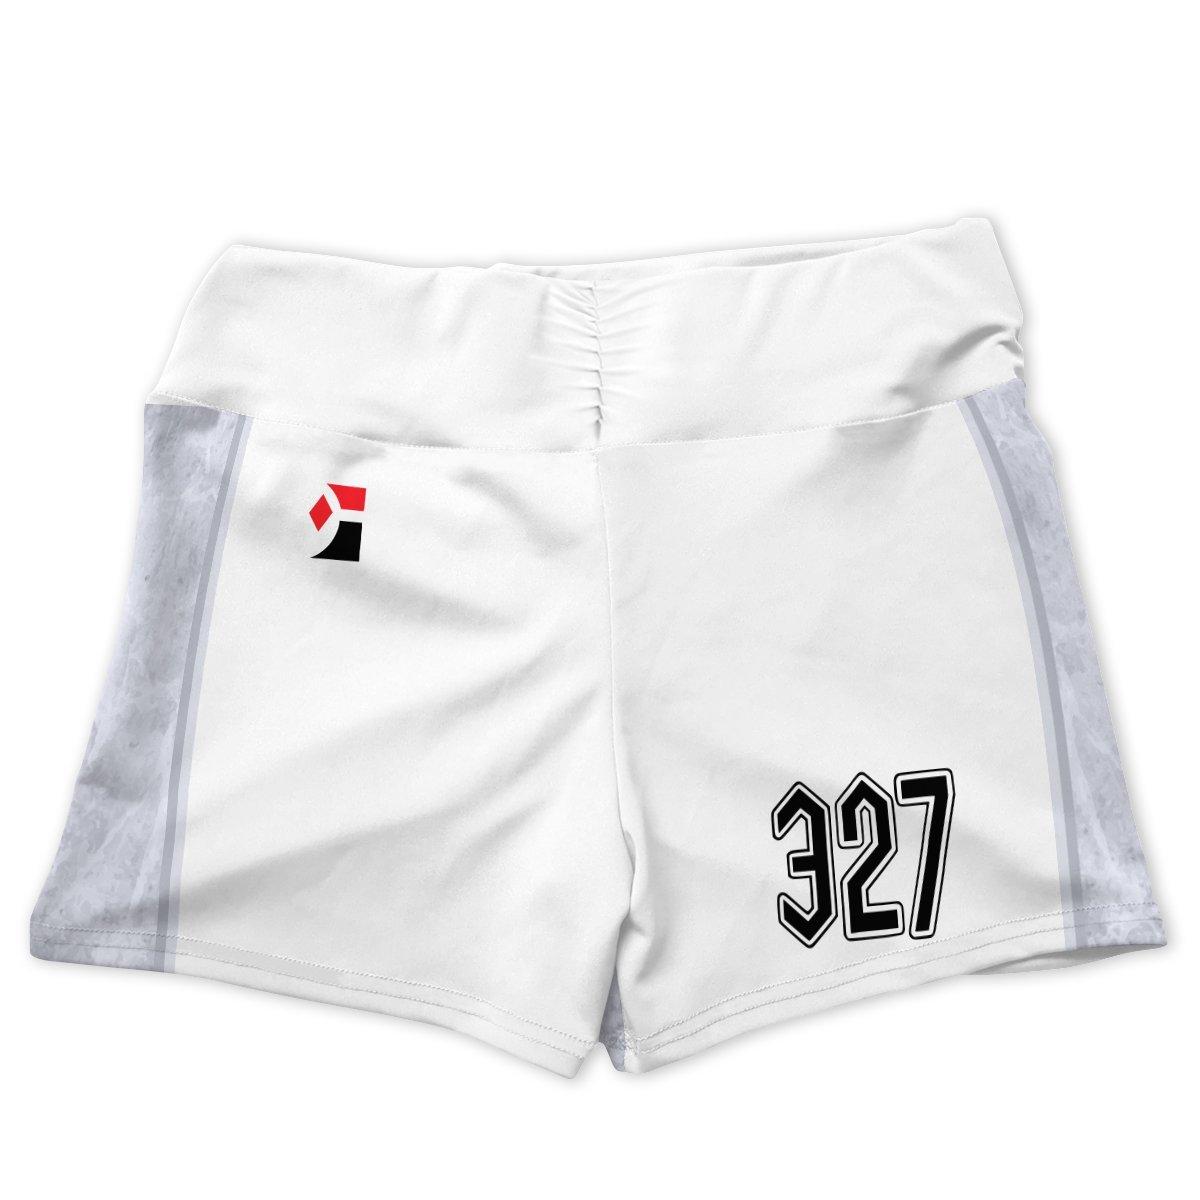 pokemon ice uniform active wear set 531430 - Anime Swimsuits